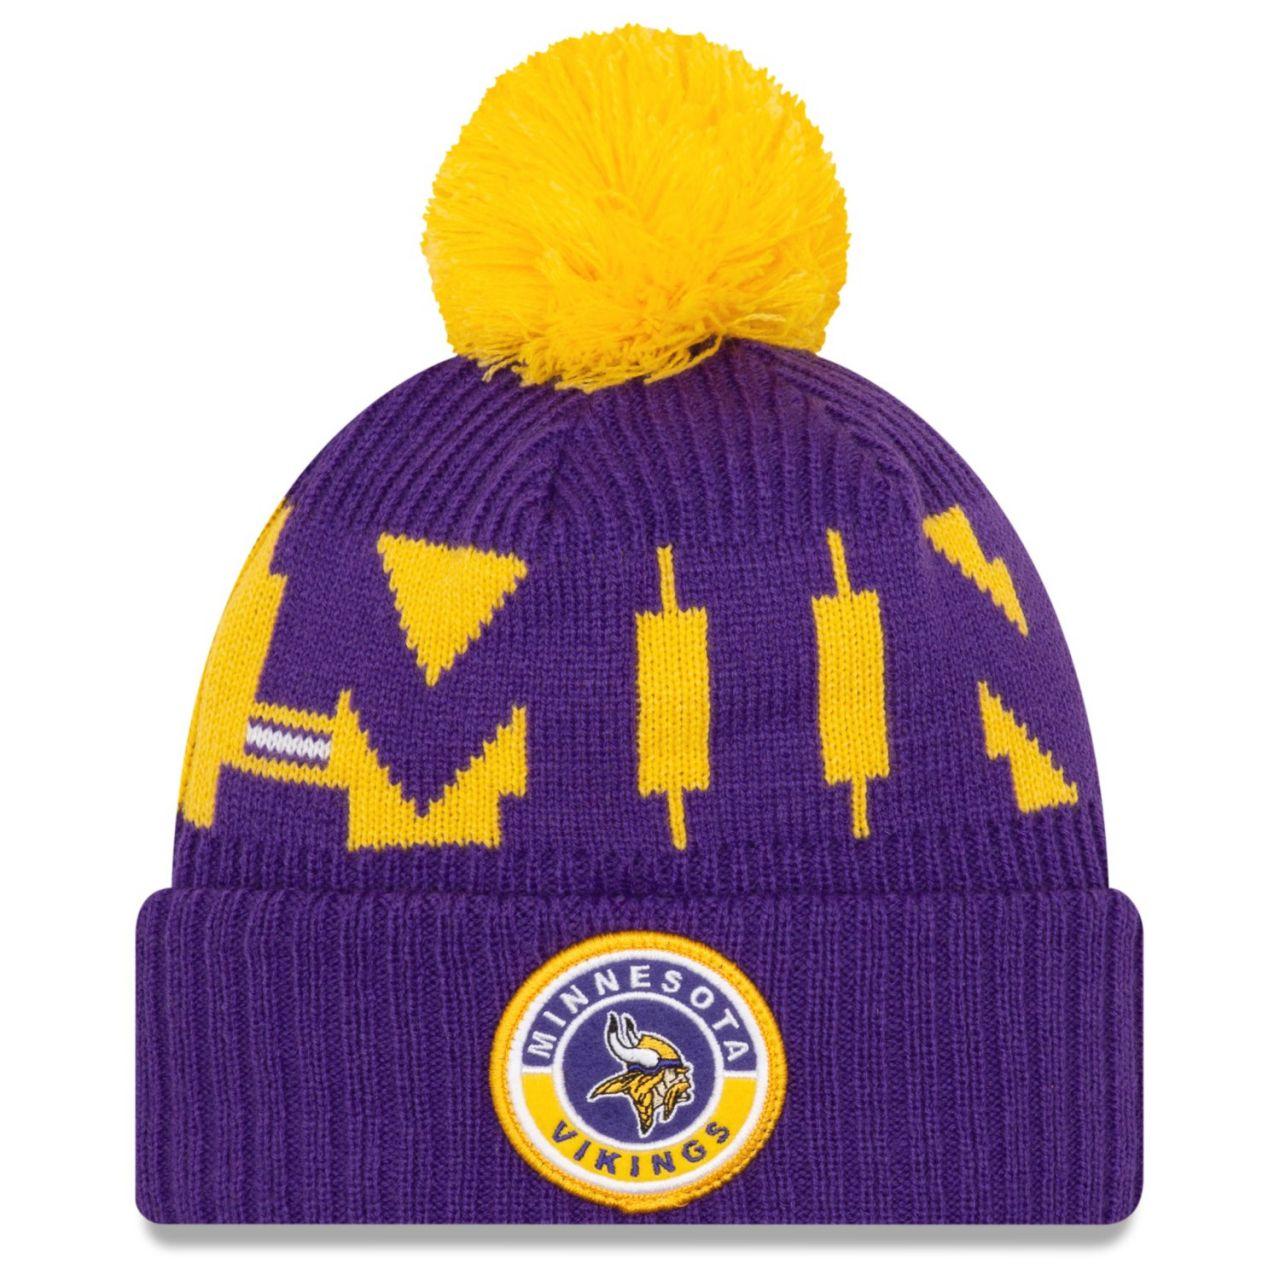 amfoo - New Era NFL ON-FIELD Sideline Mütze - Minnesota Vikings